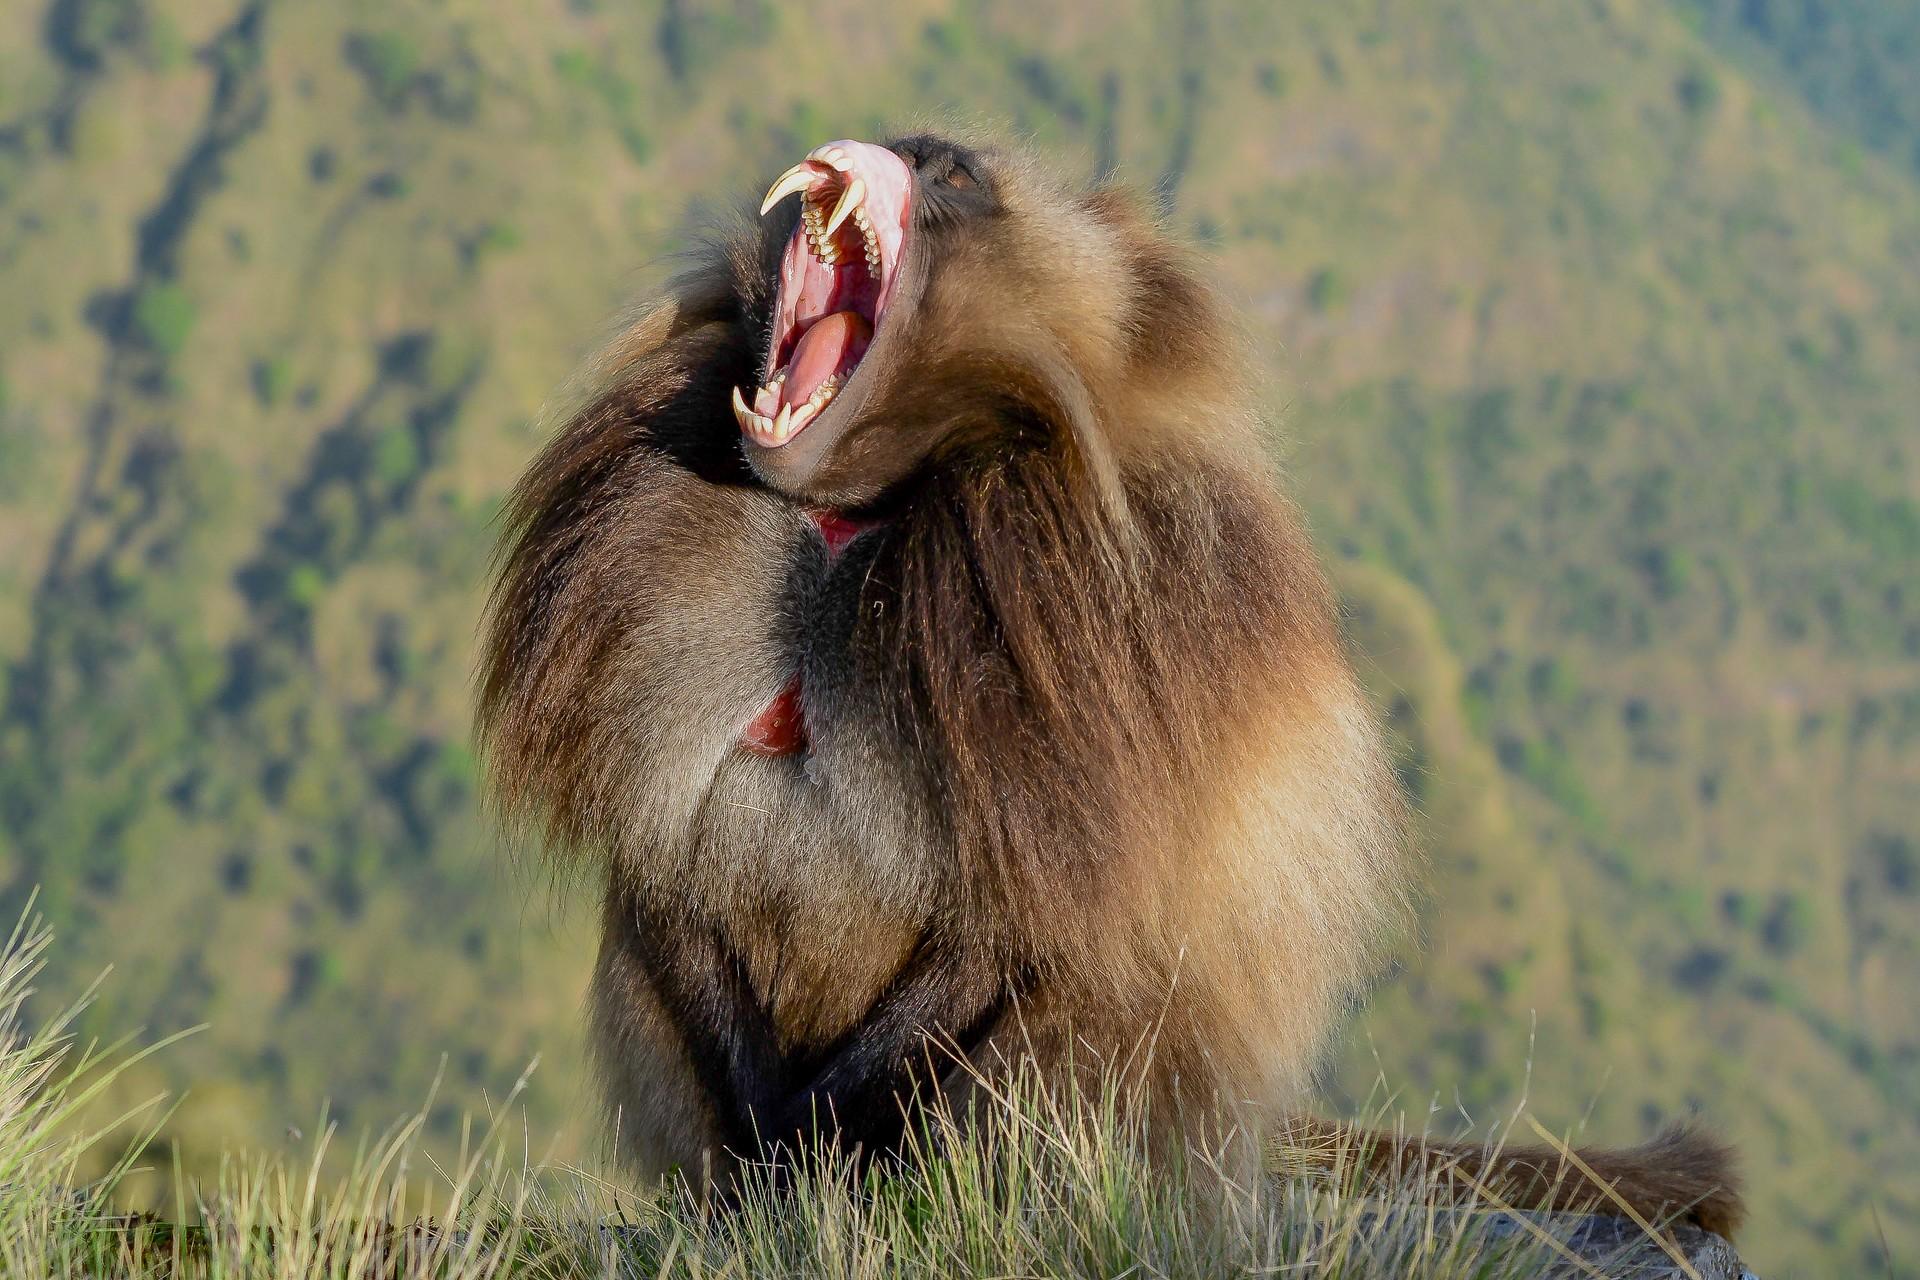 Gelada baboon exposing fangs